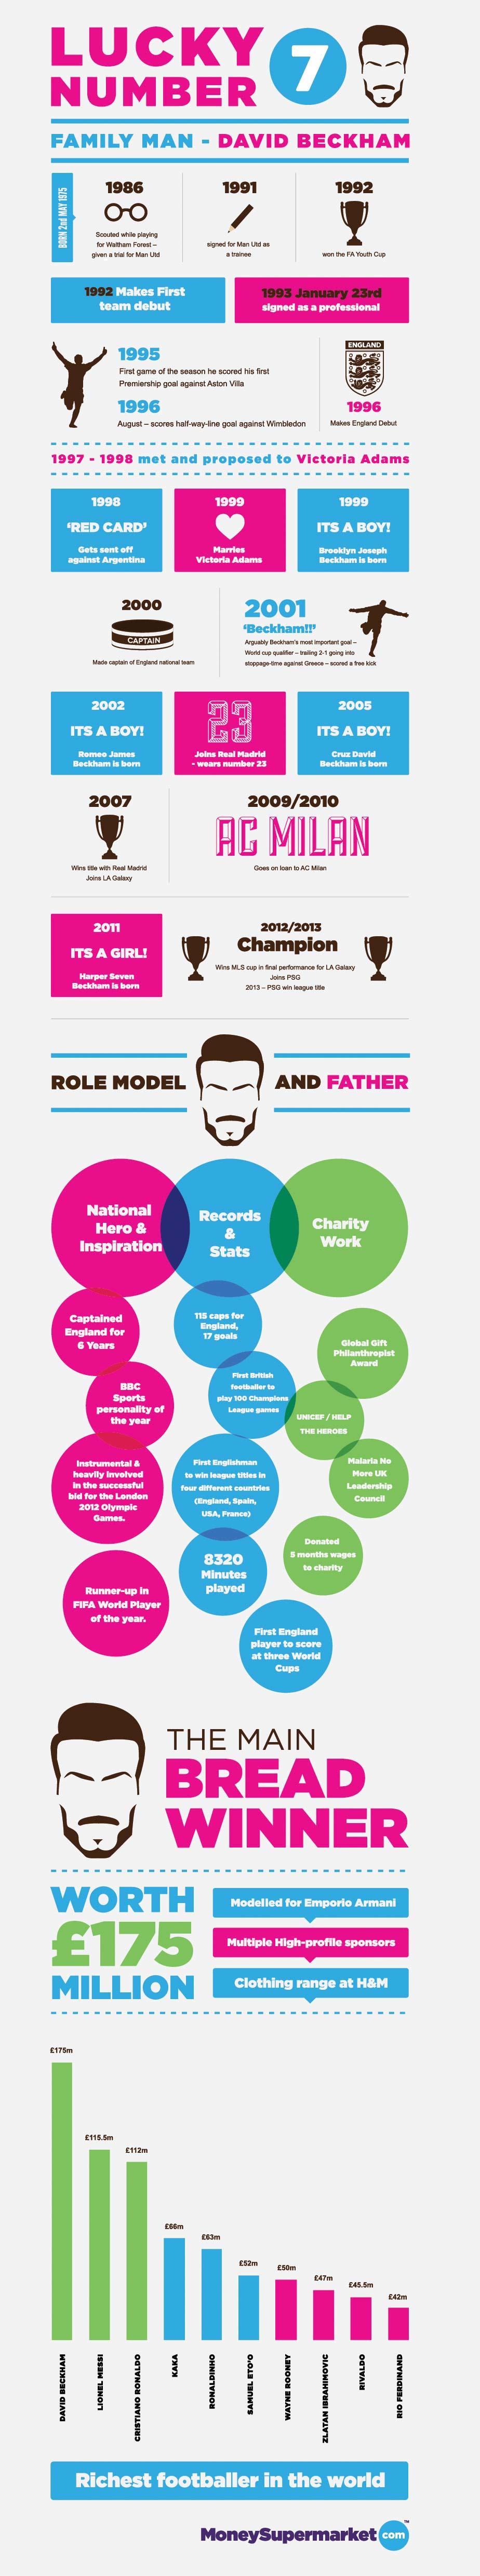 David Beckham Recap-Infographic